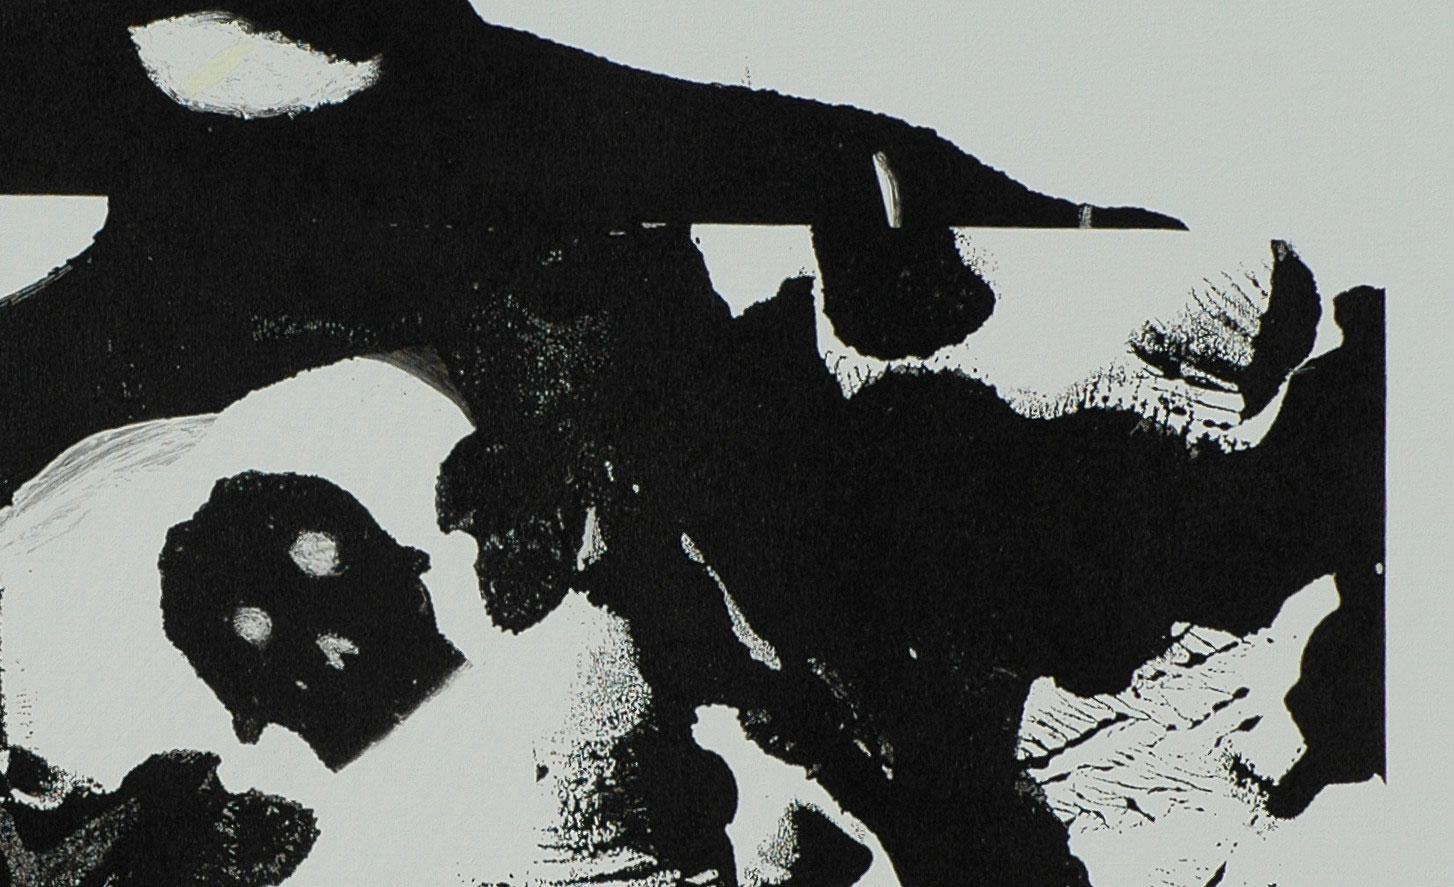 Loup-devorant-2004-detail